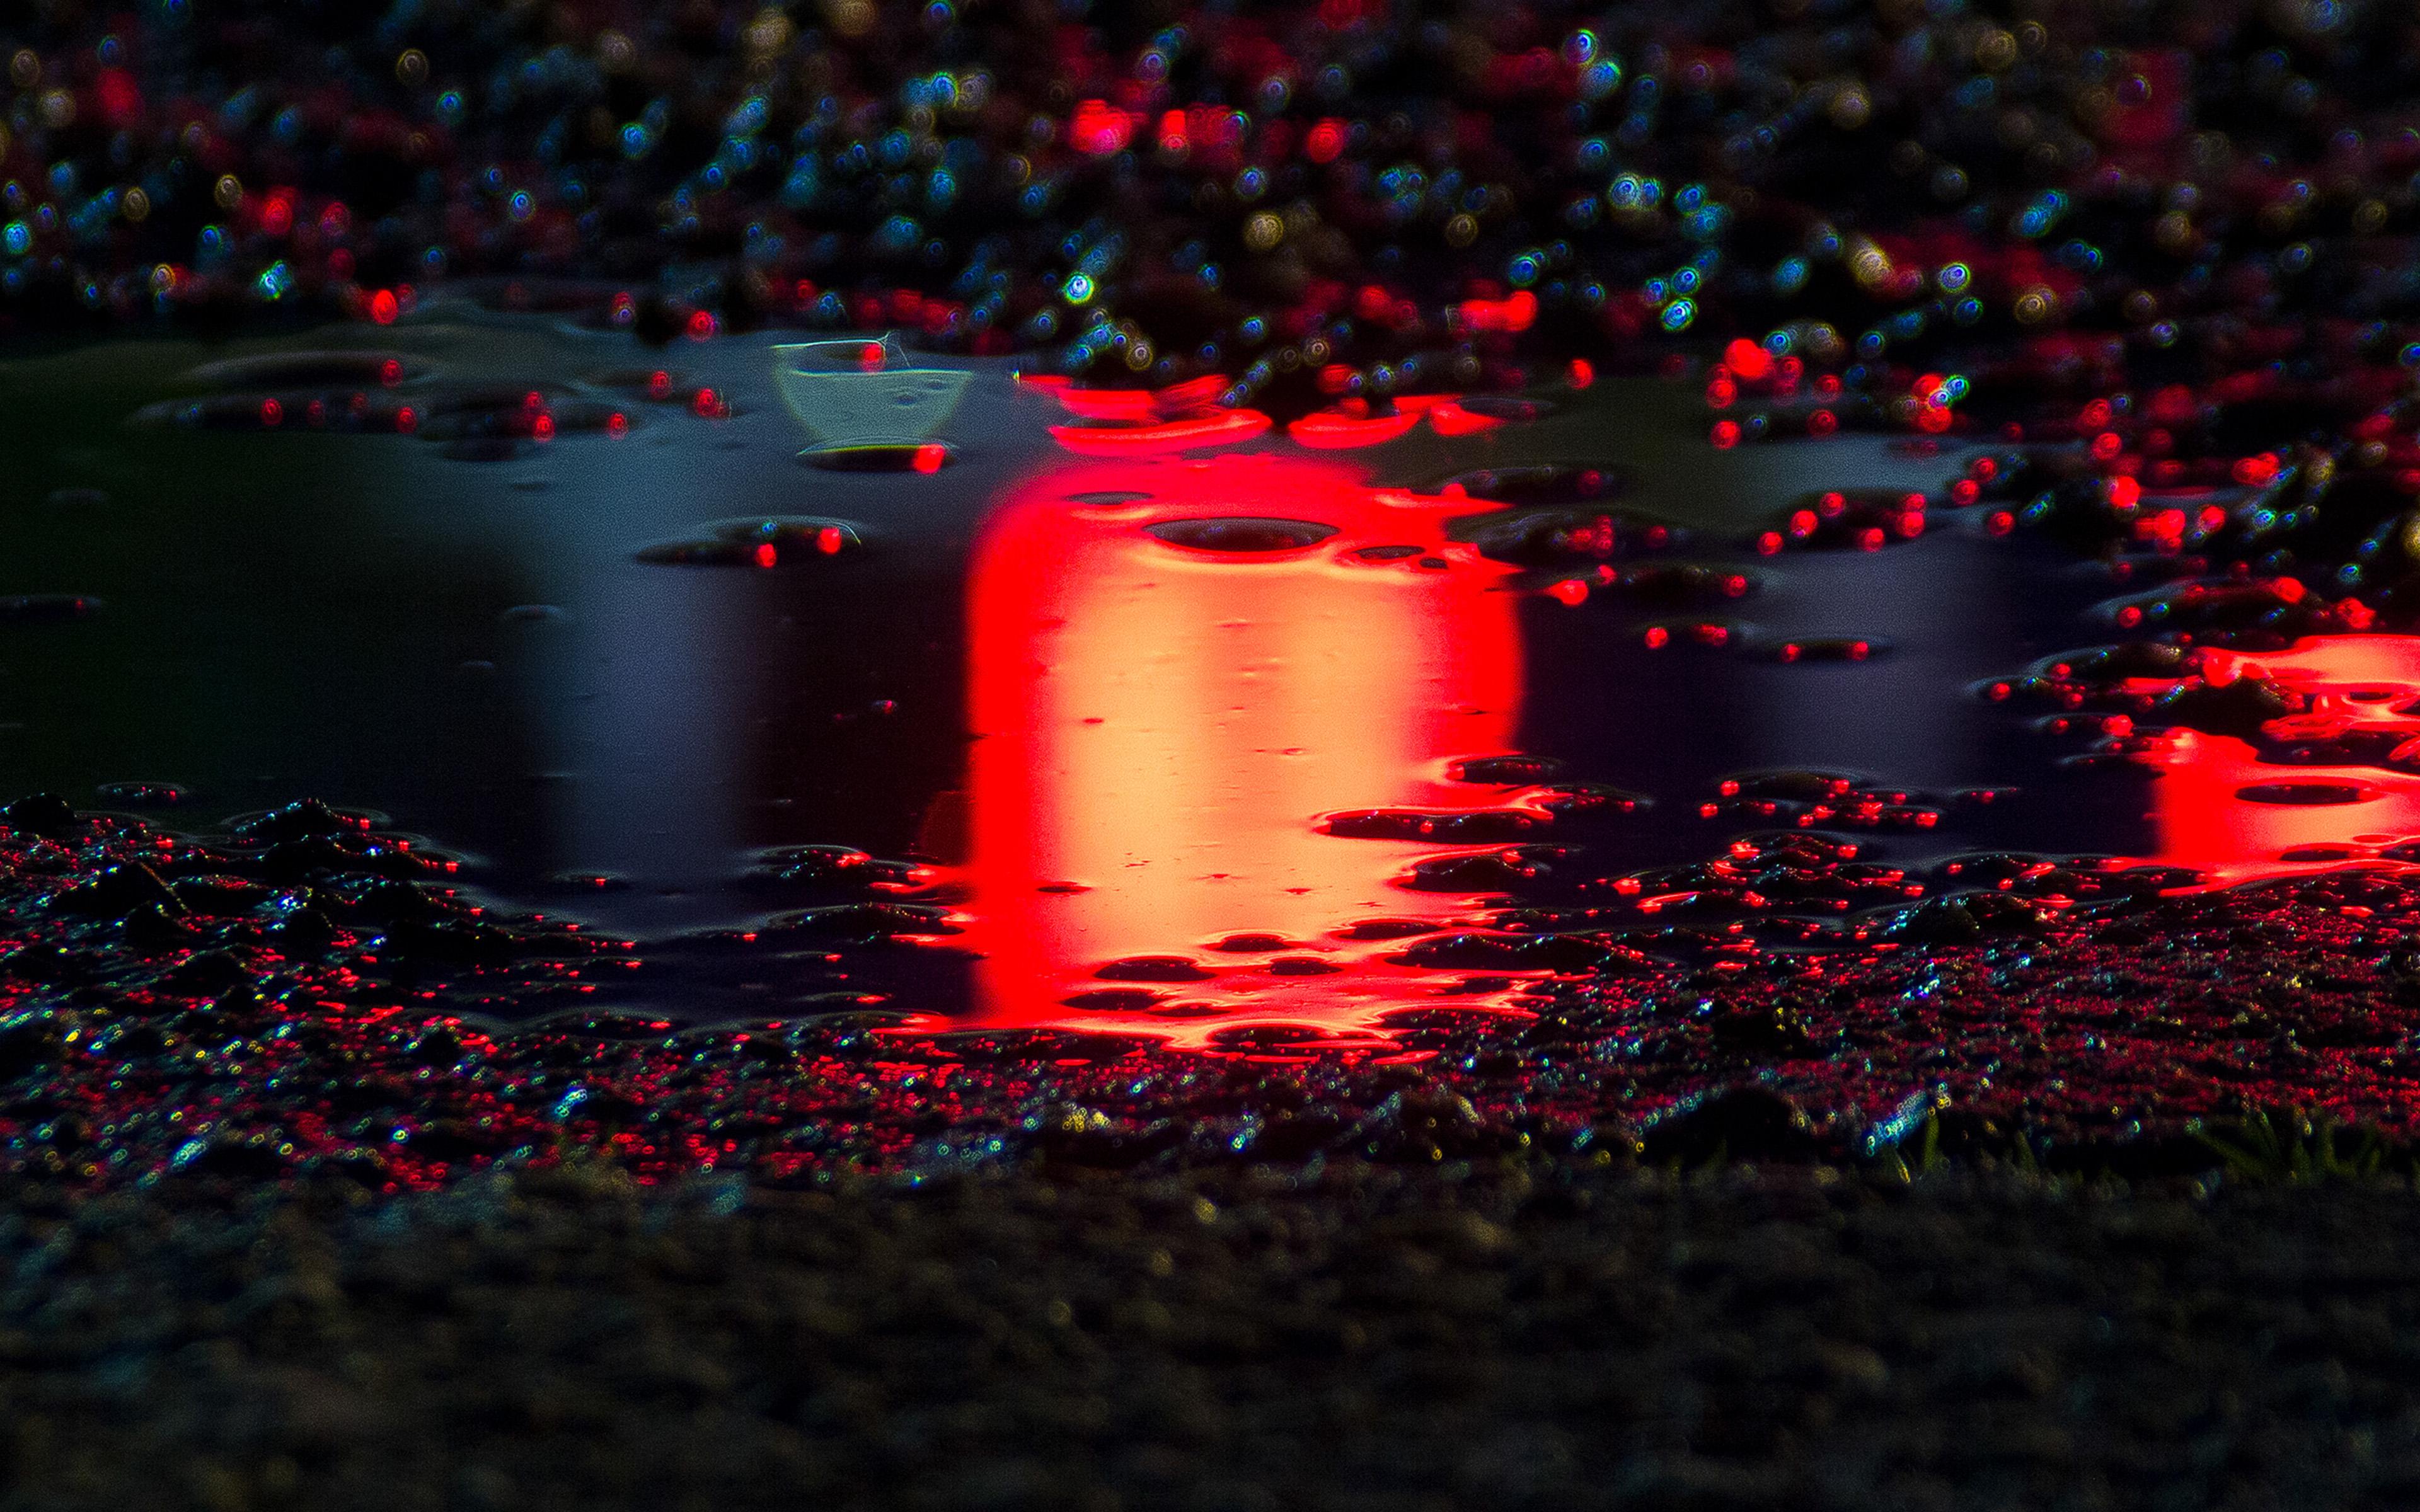 Old Car Car Sports Car Sports Landscape Rain Water: Bf60-rain-red-bokeh-water-asphalt-art-light-wallpaper